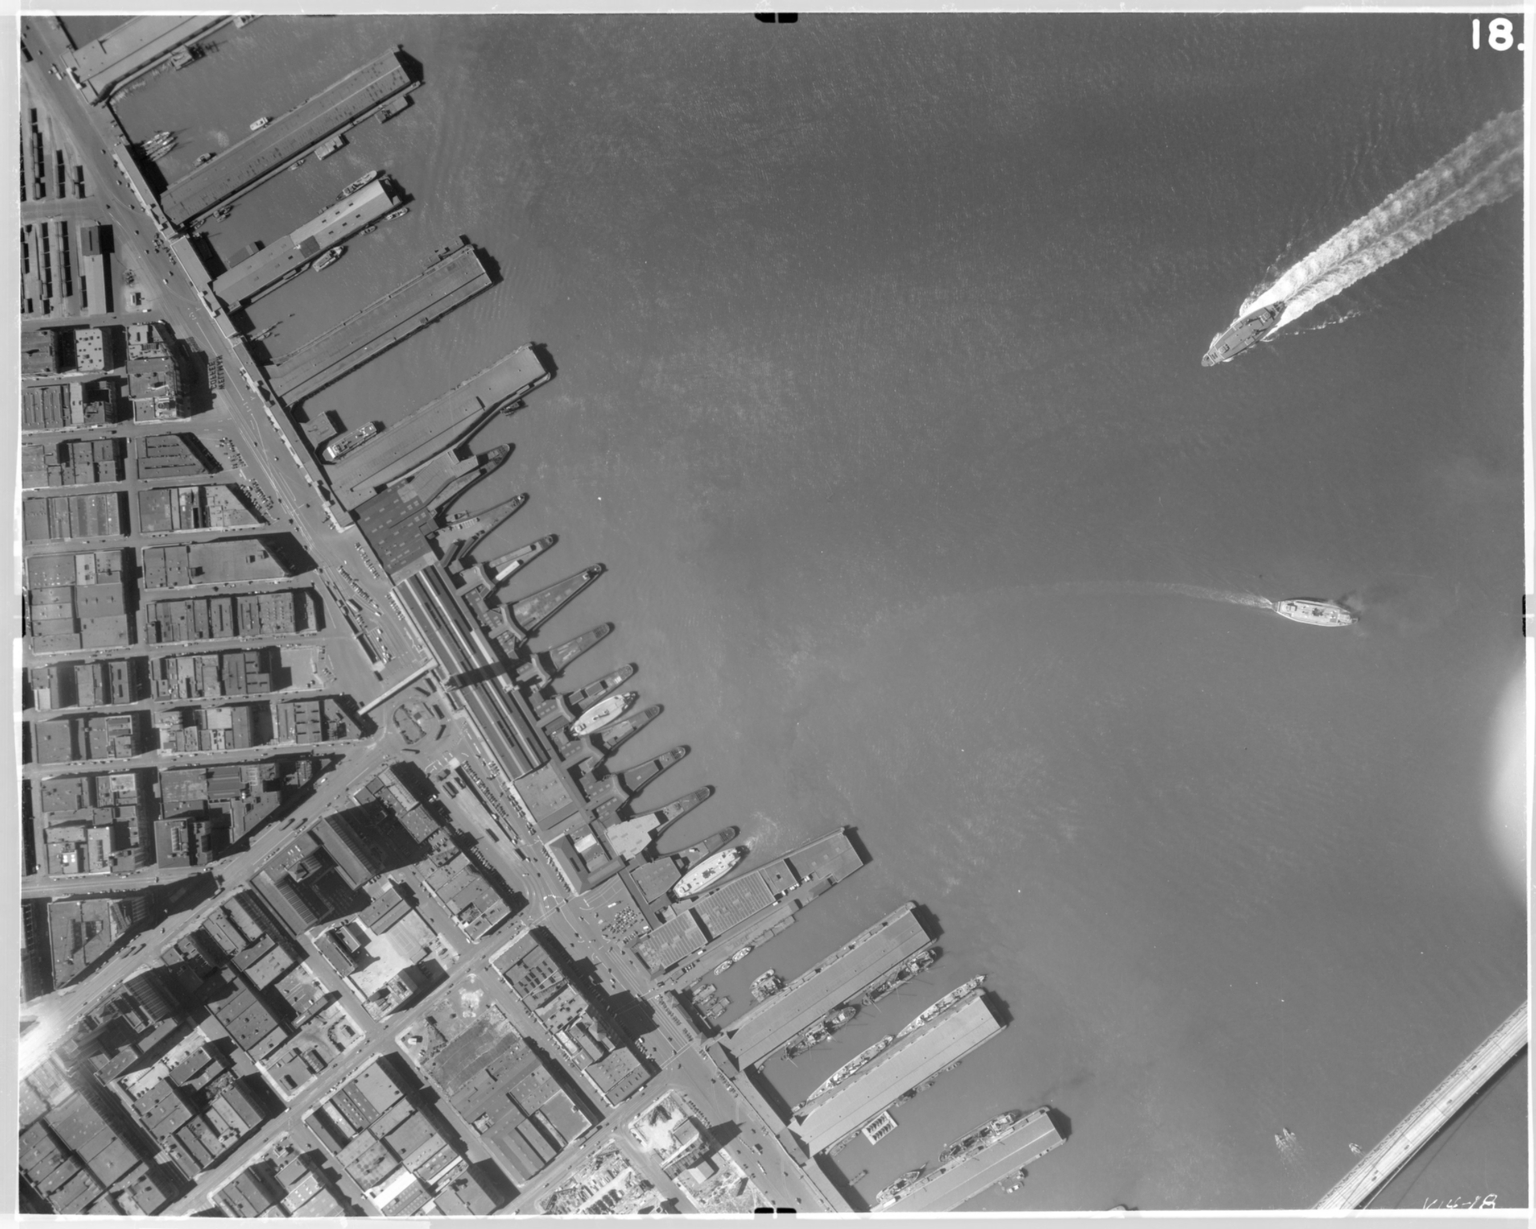 18. San Francisco Aerial Negative.